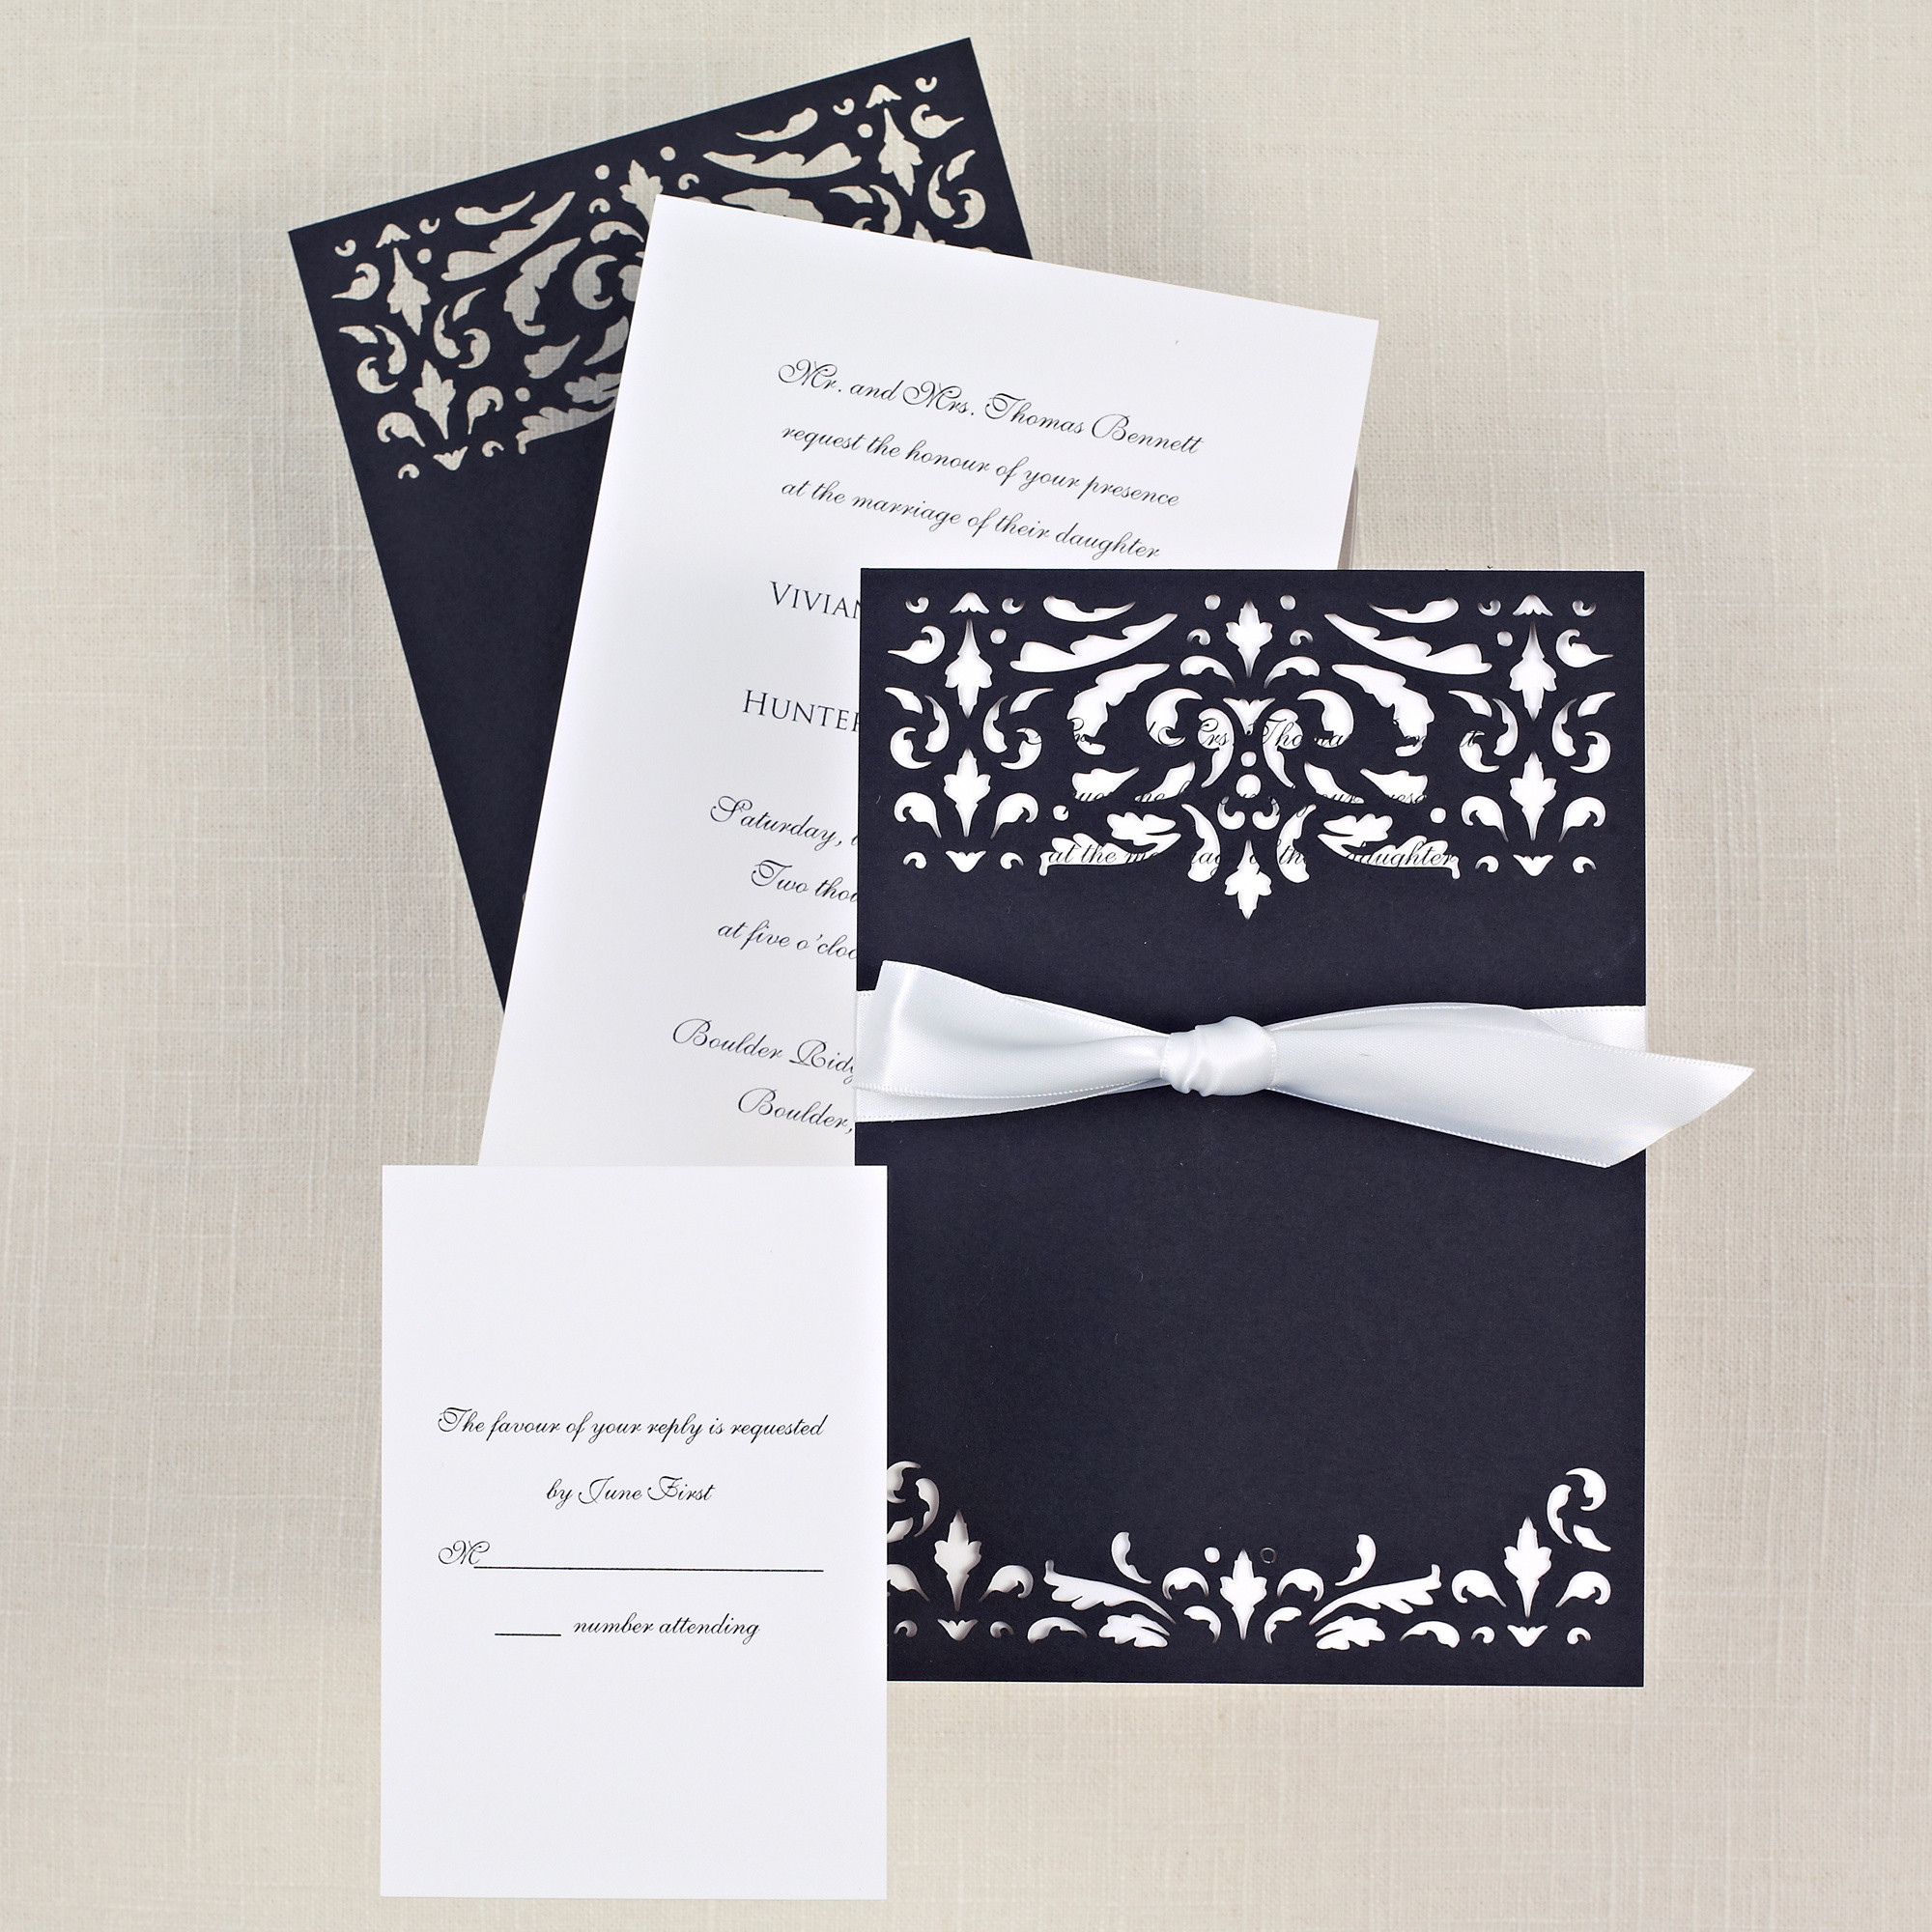 Midnight Romance Wedding Invitation